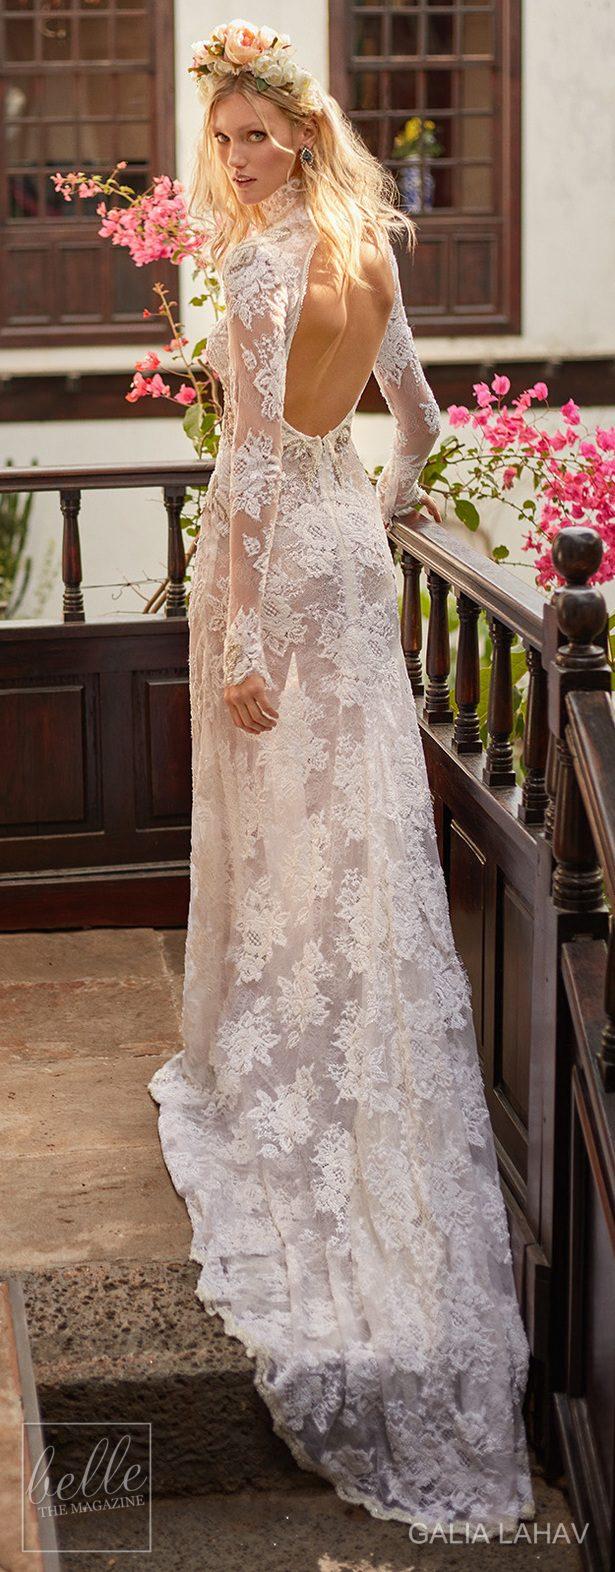 bohemian summer wedding dresses photo - 1